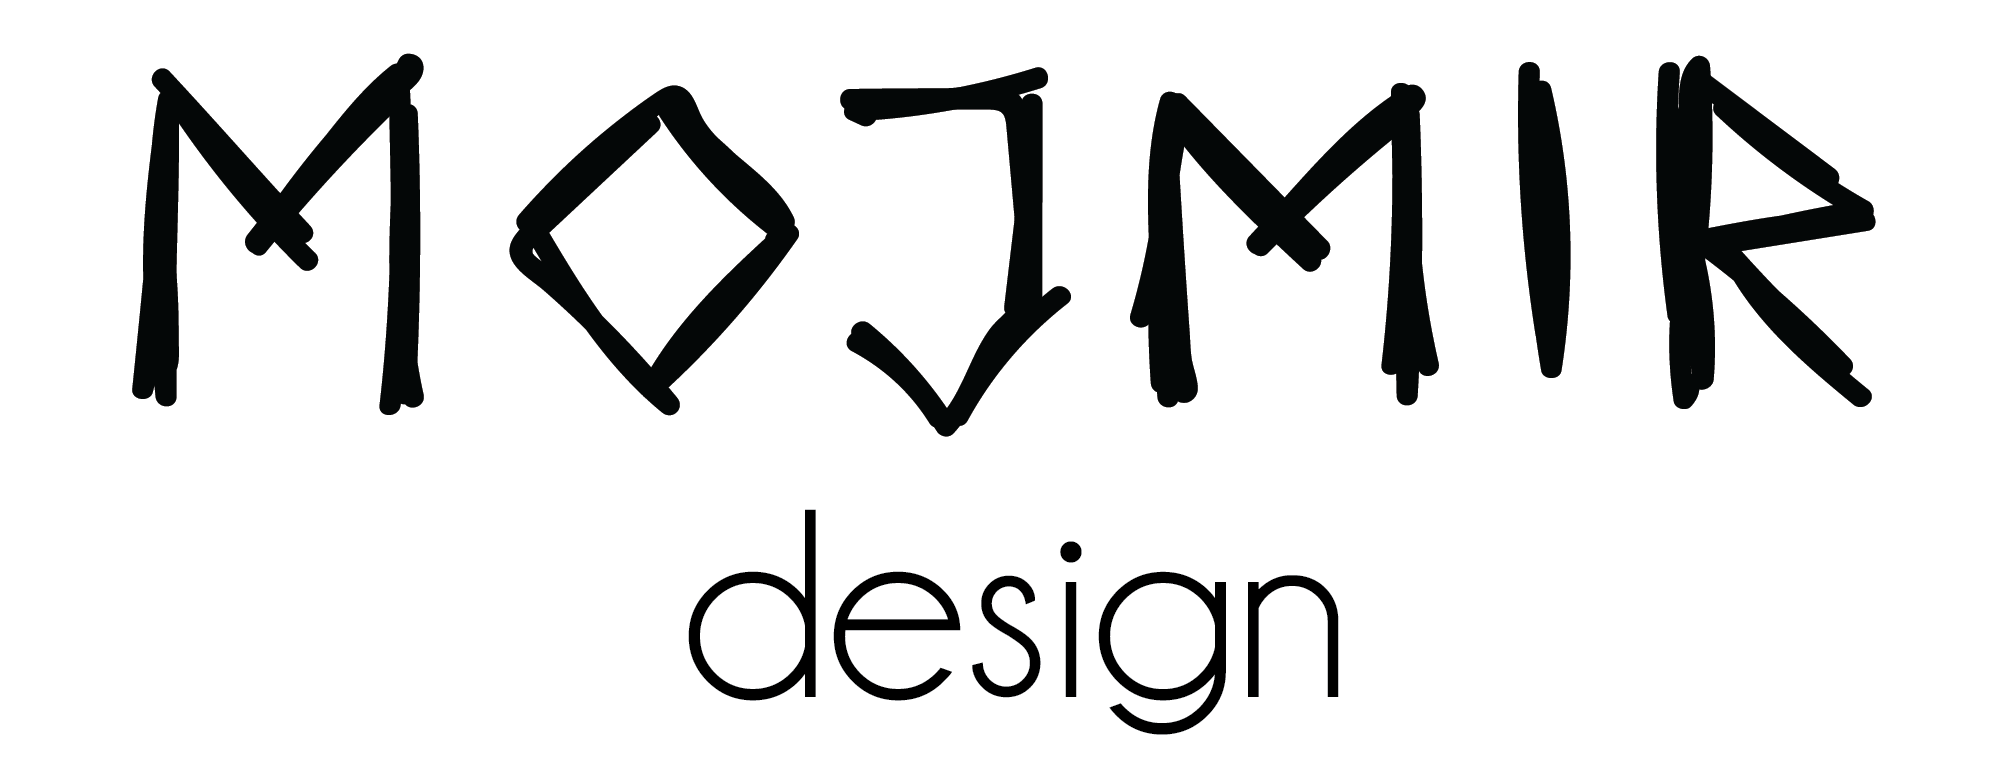 Mojmir design - pracownia projektowa